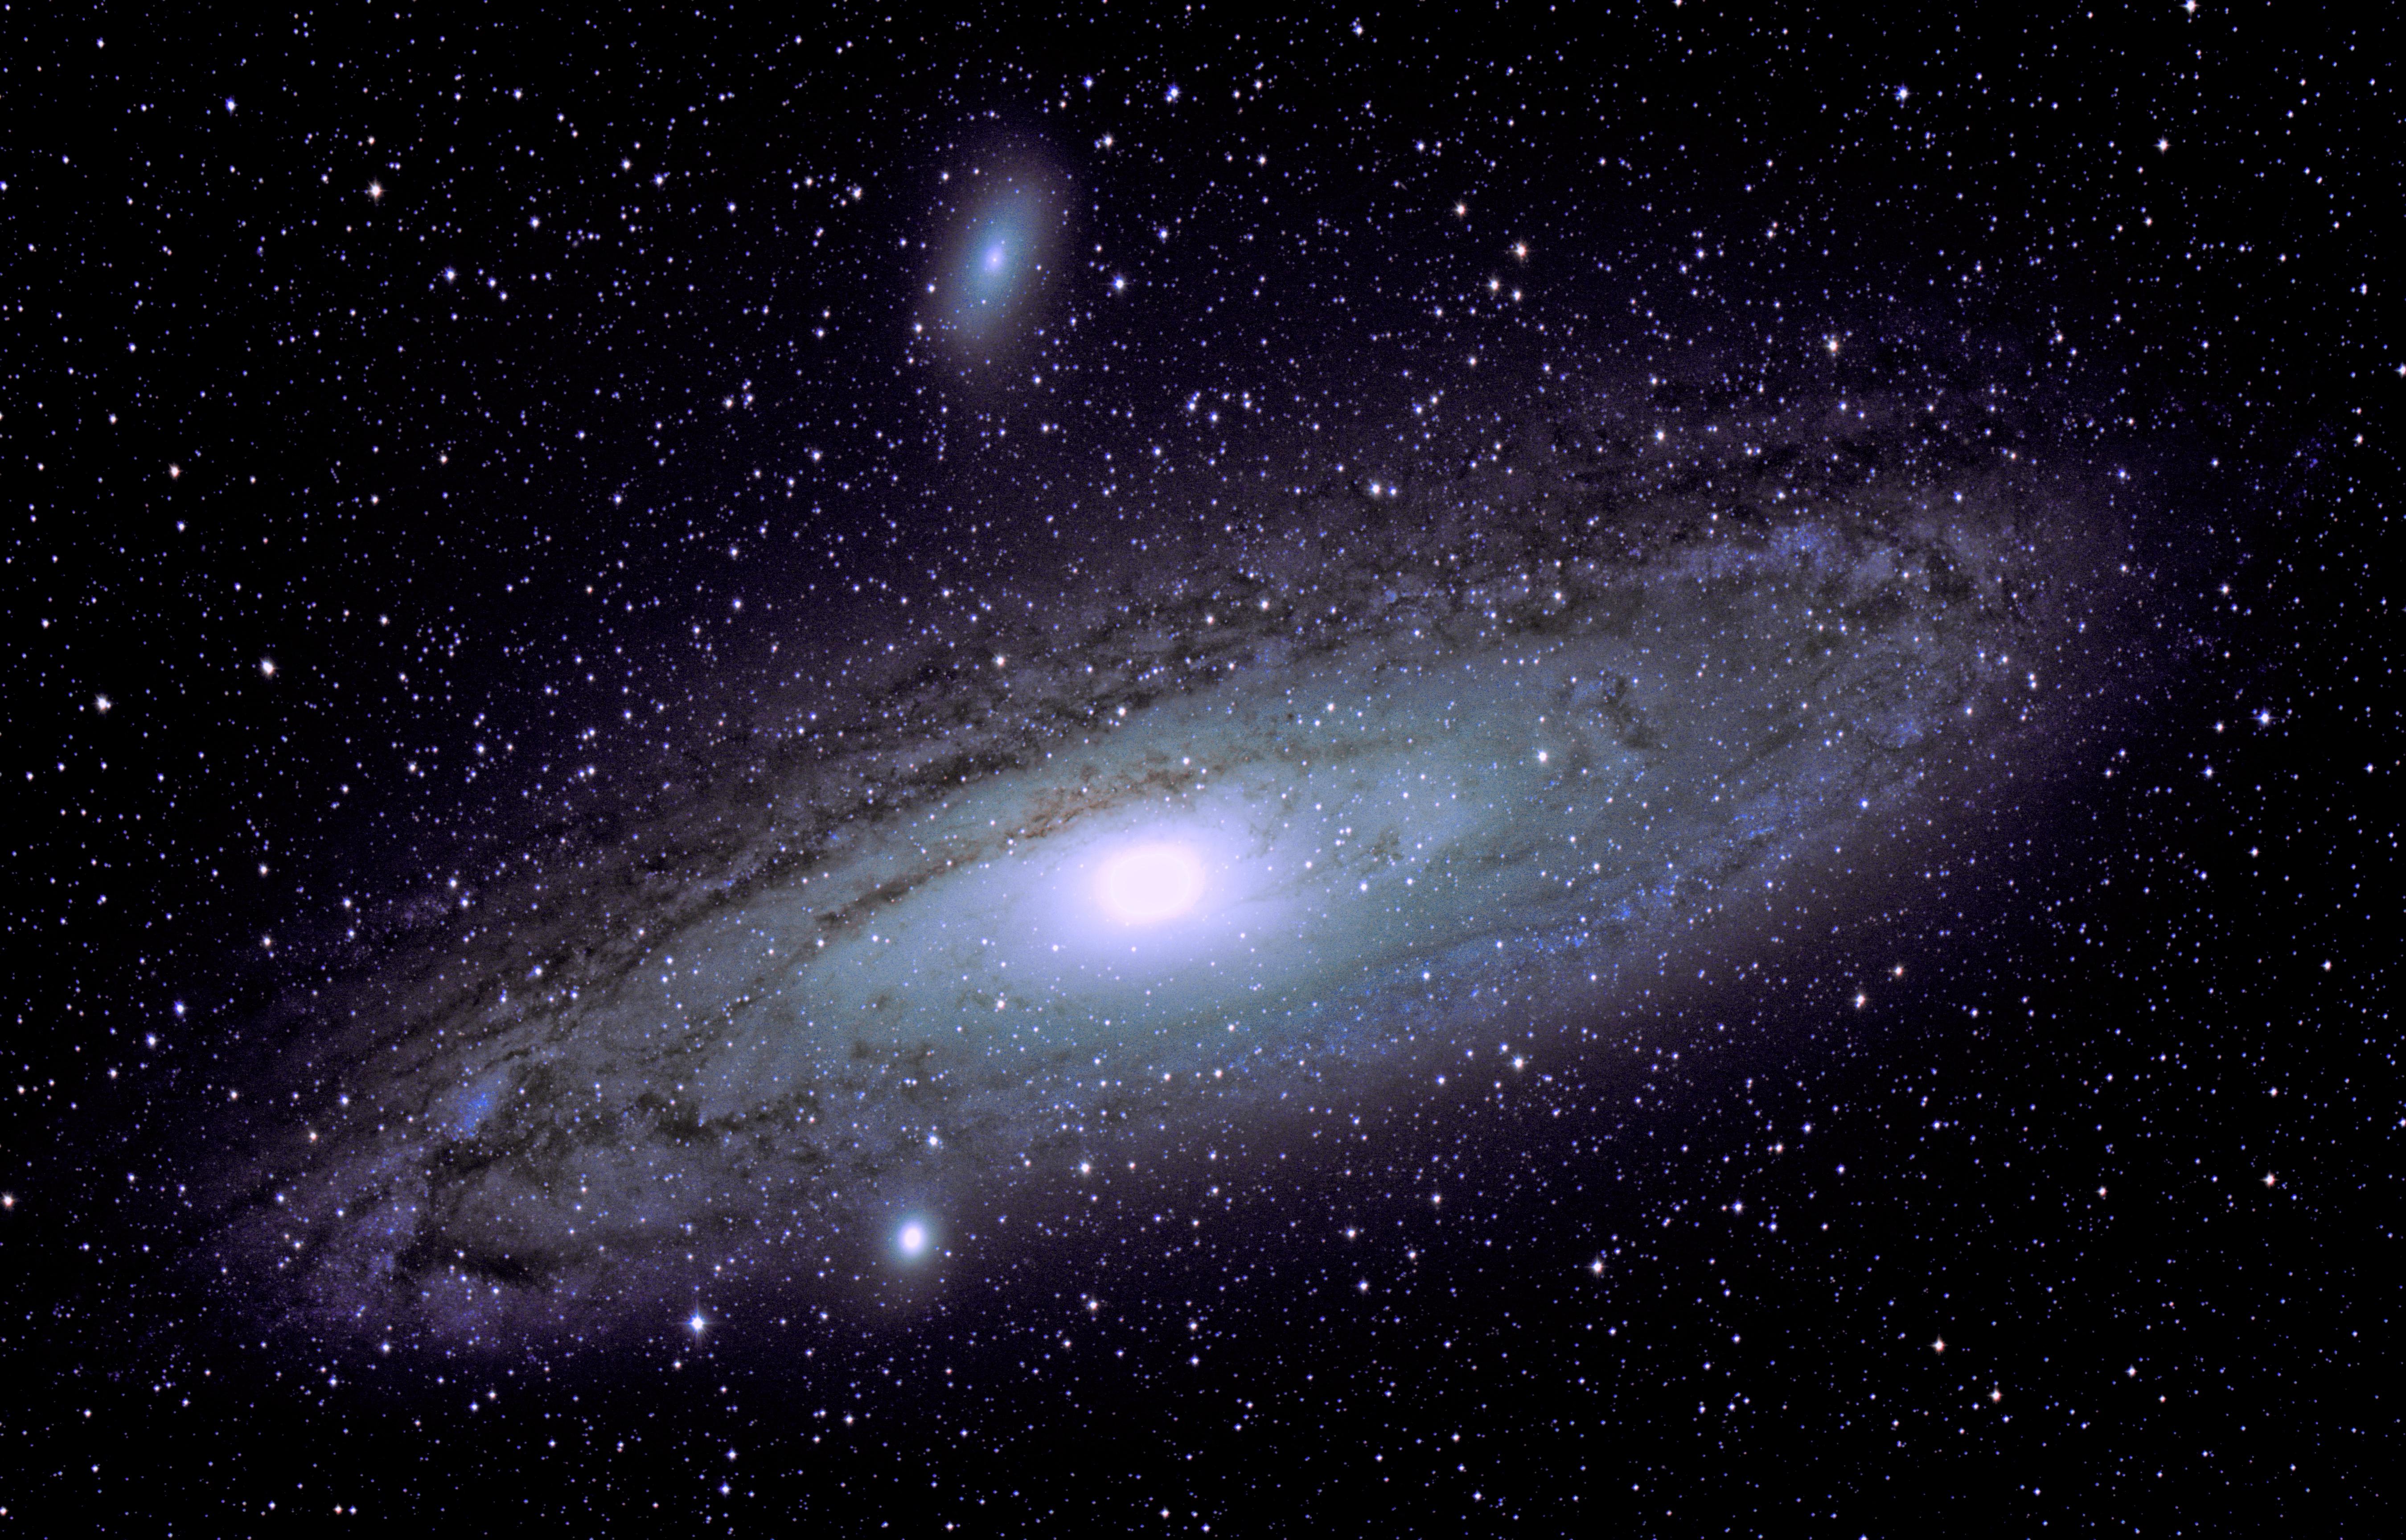 Galaxy Space Stars 5398x3456